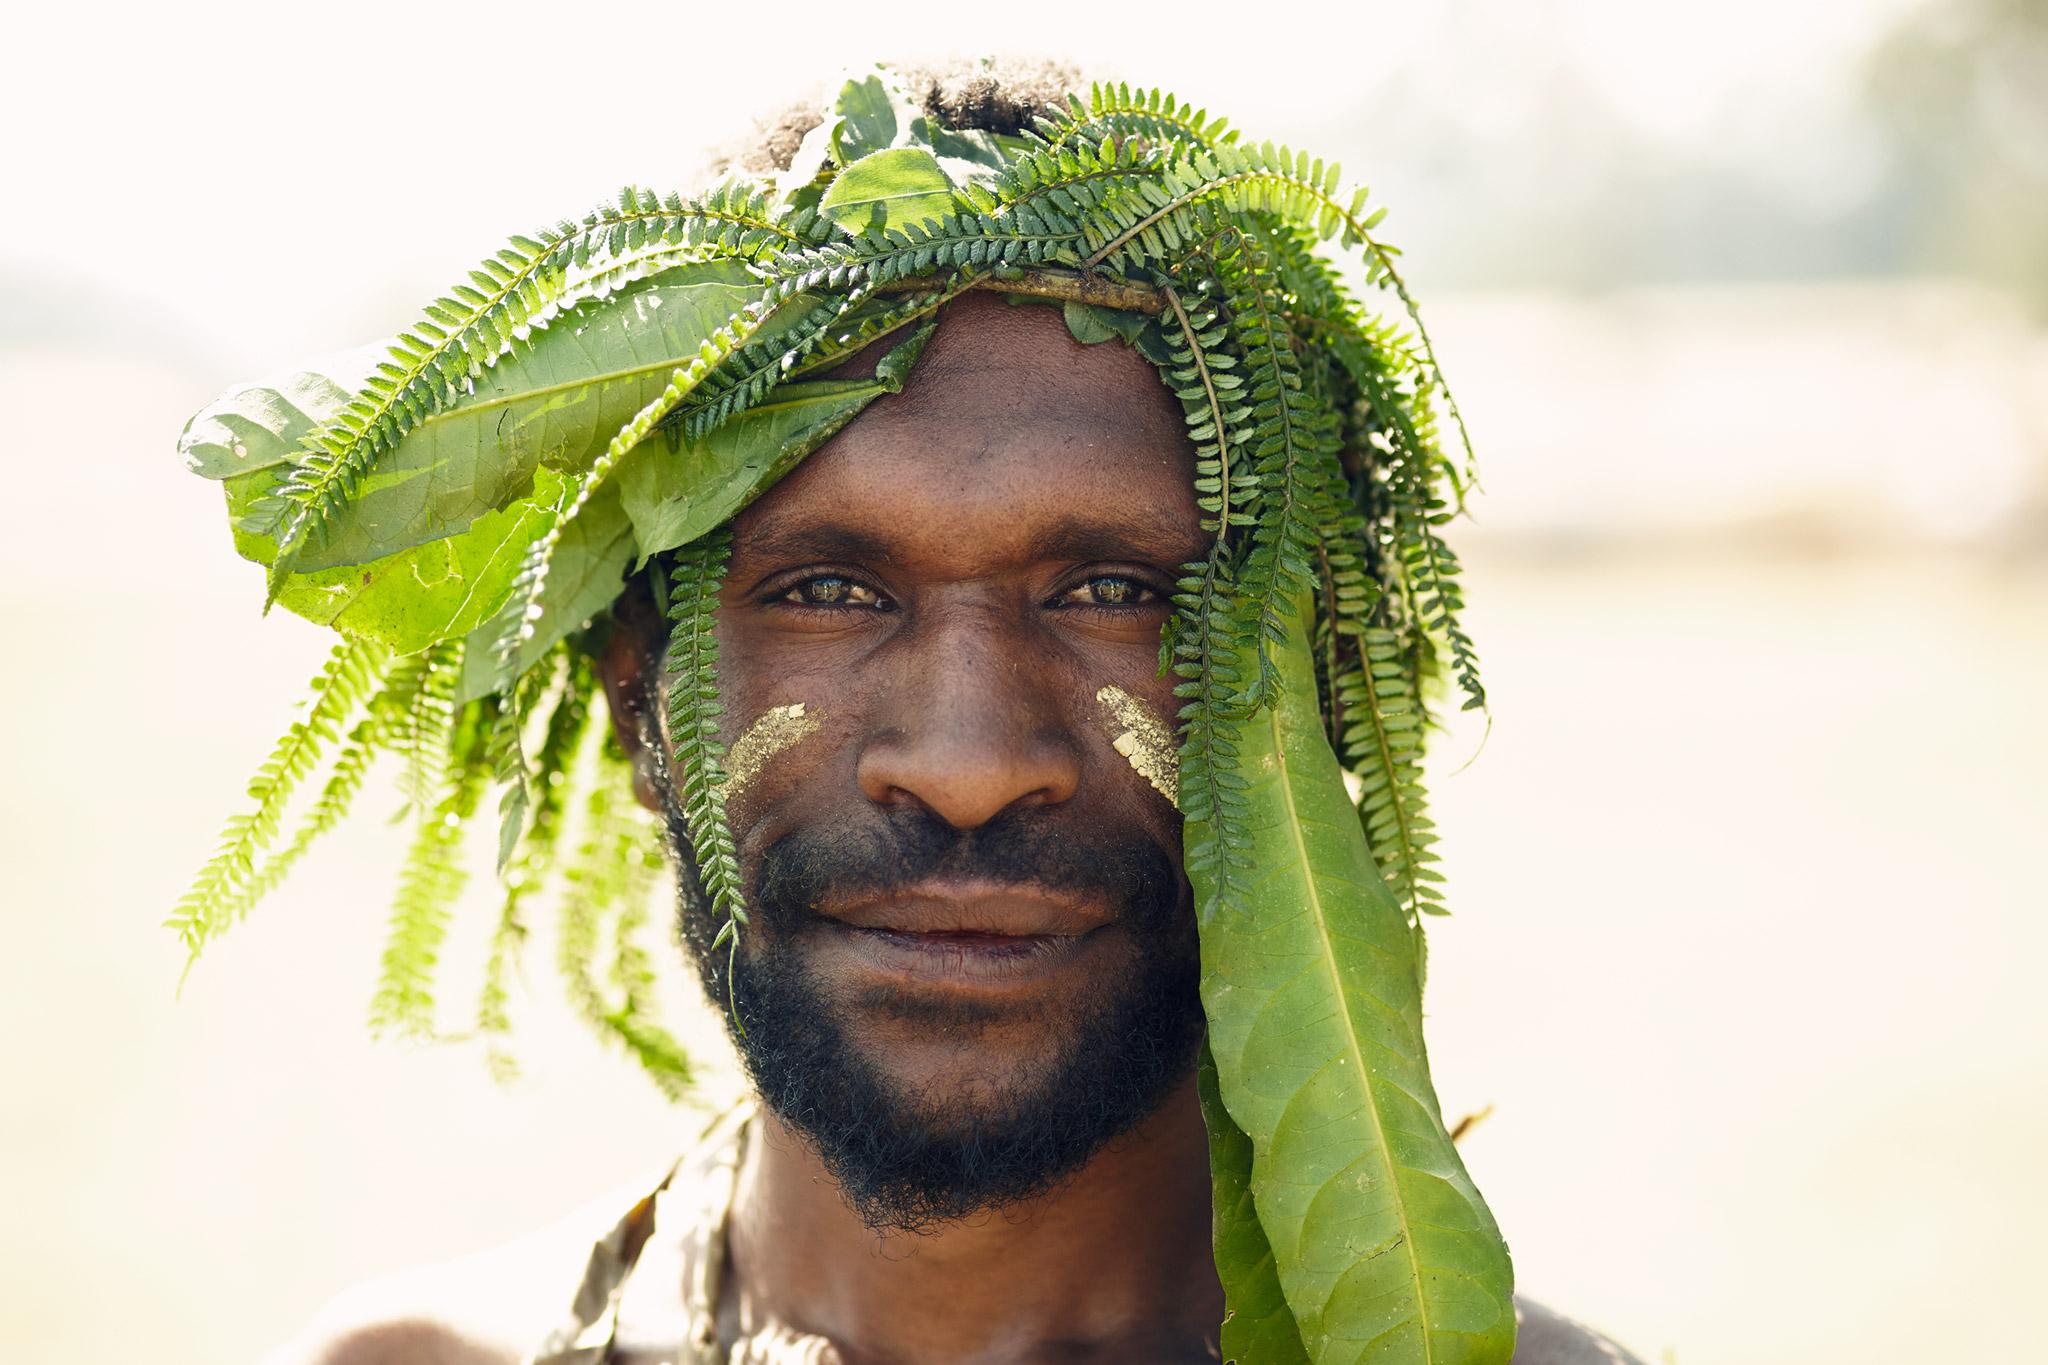 YONKI WARRIOR, PAPUA NEW GUINEA